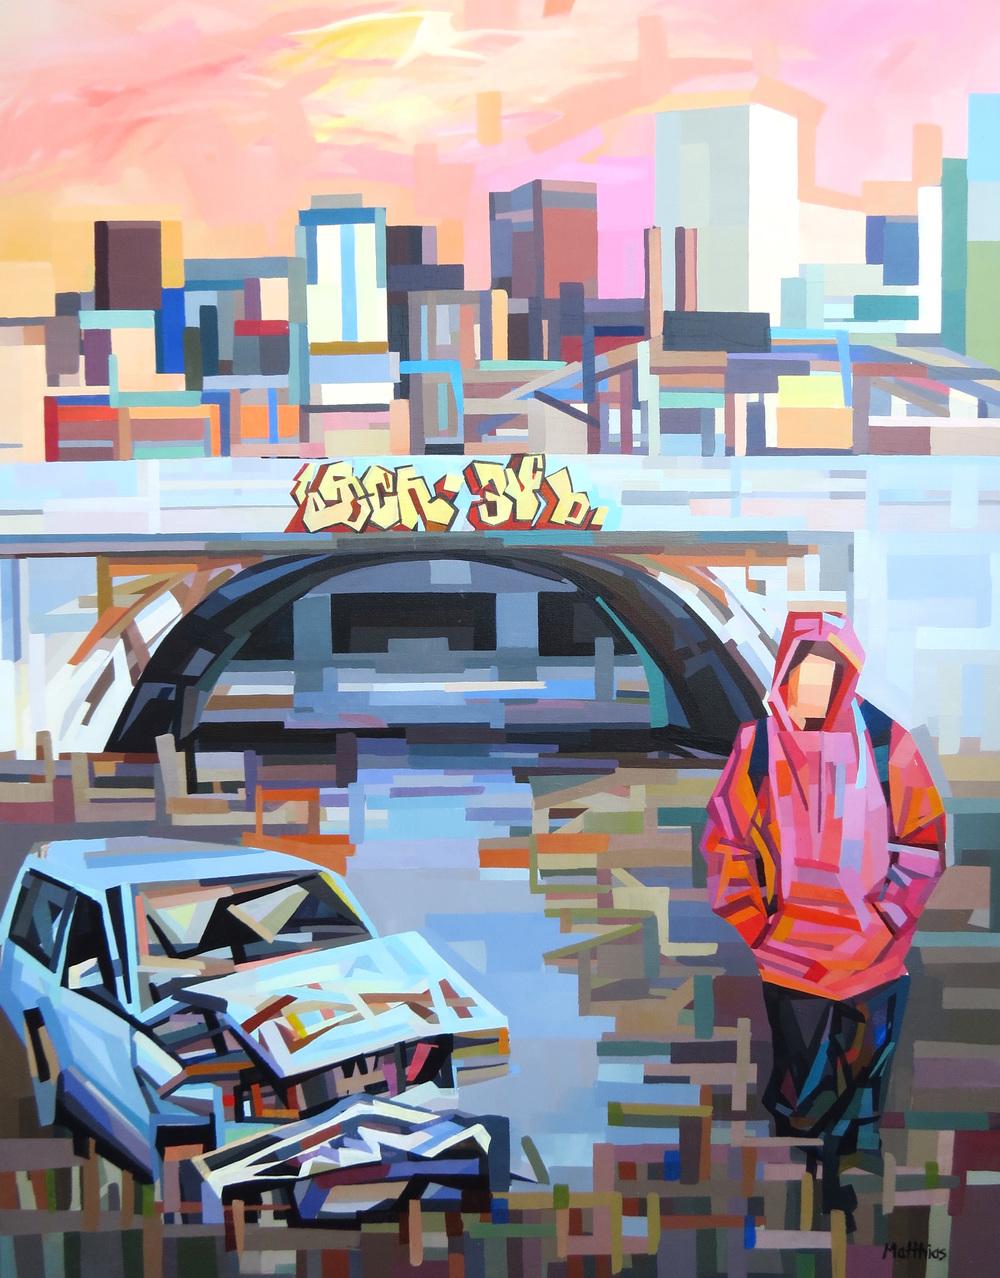 Urban Landscape 3 48x36 sold